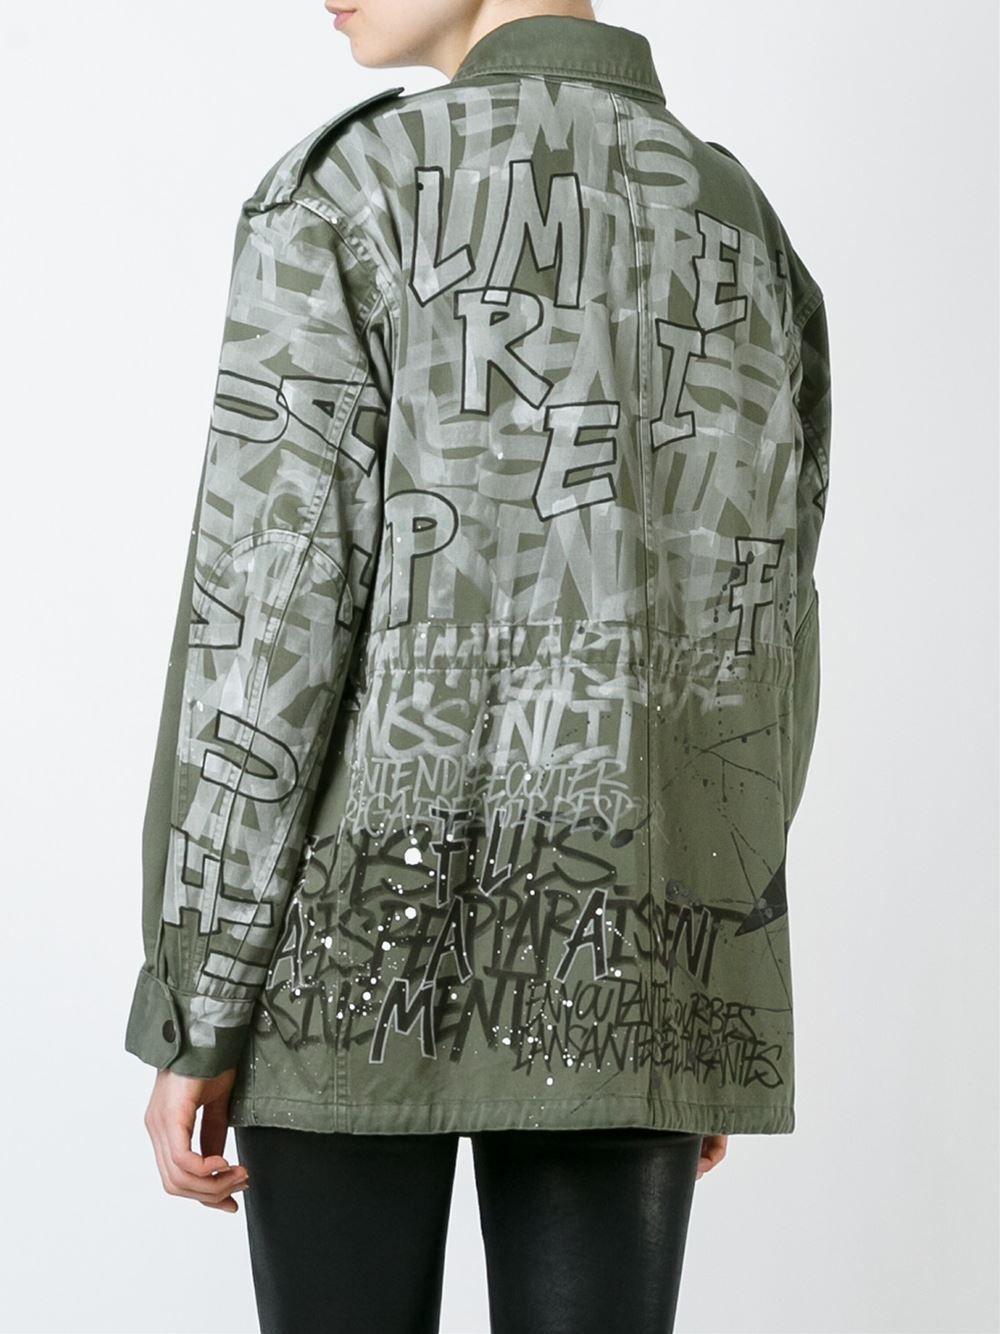 0864426c0c7 Faith Connexion - Graffiti Print Military Jacket Military Jacket Women